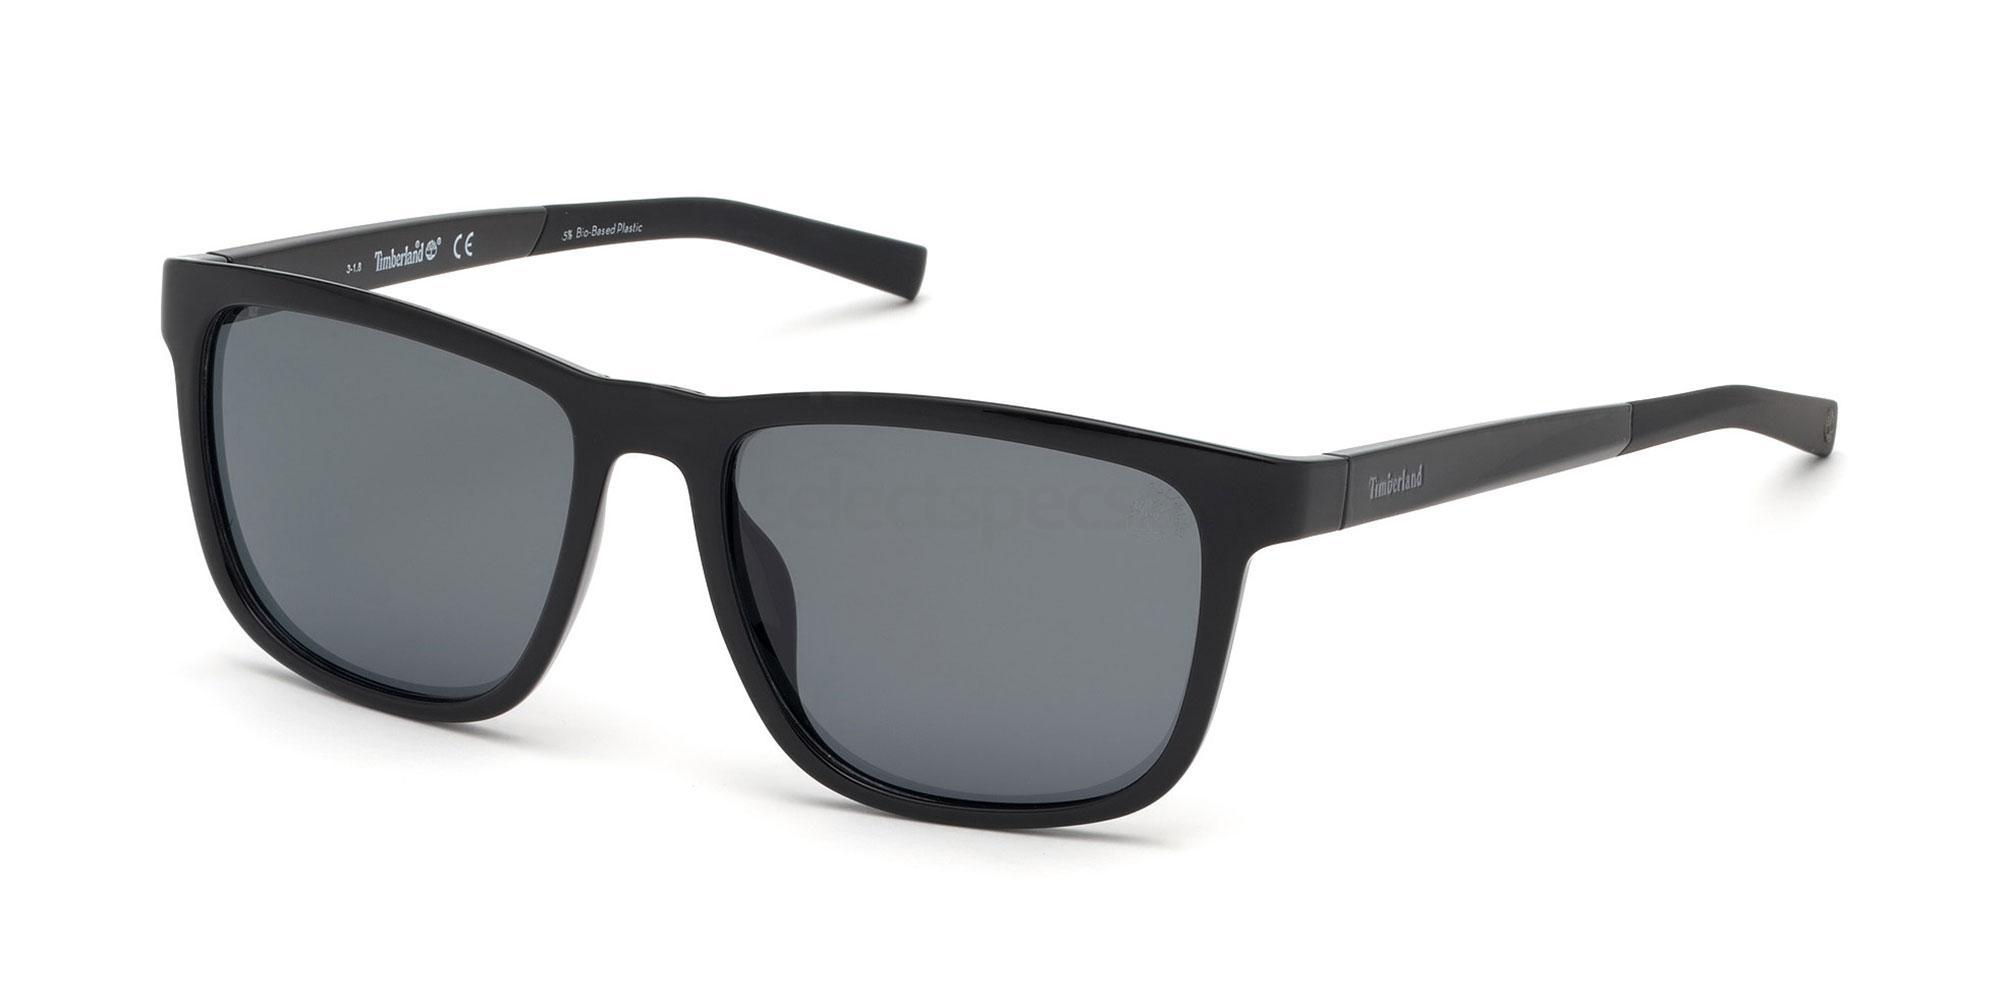 01D TB9162 Sunglasses, Timberland